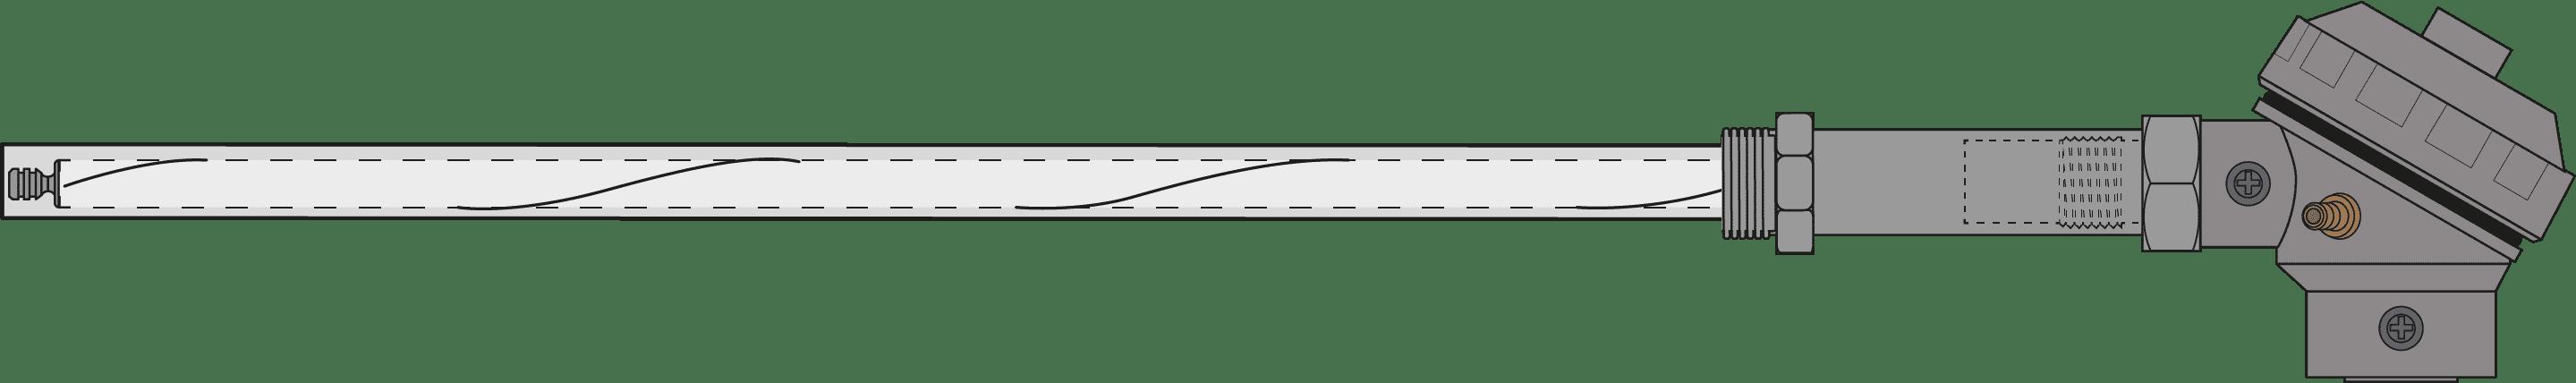 Sauerstoffsonde CarboPorbe DS Econox